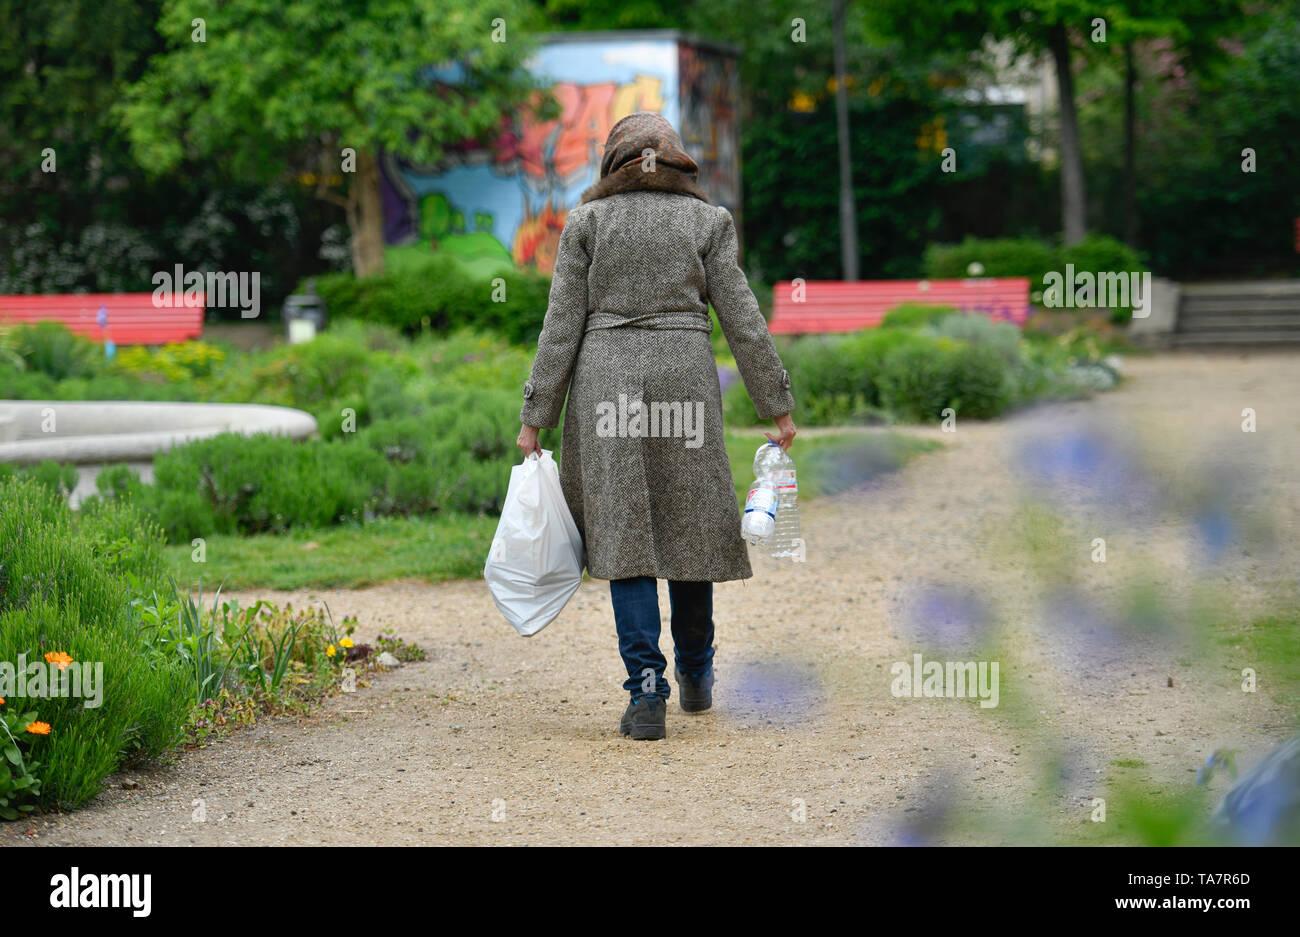 Put symbolic photo, old-age poverty, senior, bottle collecting, park, Gestelltes Symbolfoto, Altersarmut, Seniorin, Flaschensammeln, Park Stock Photo